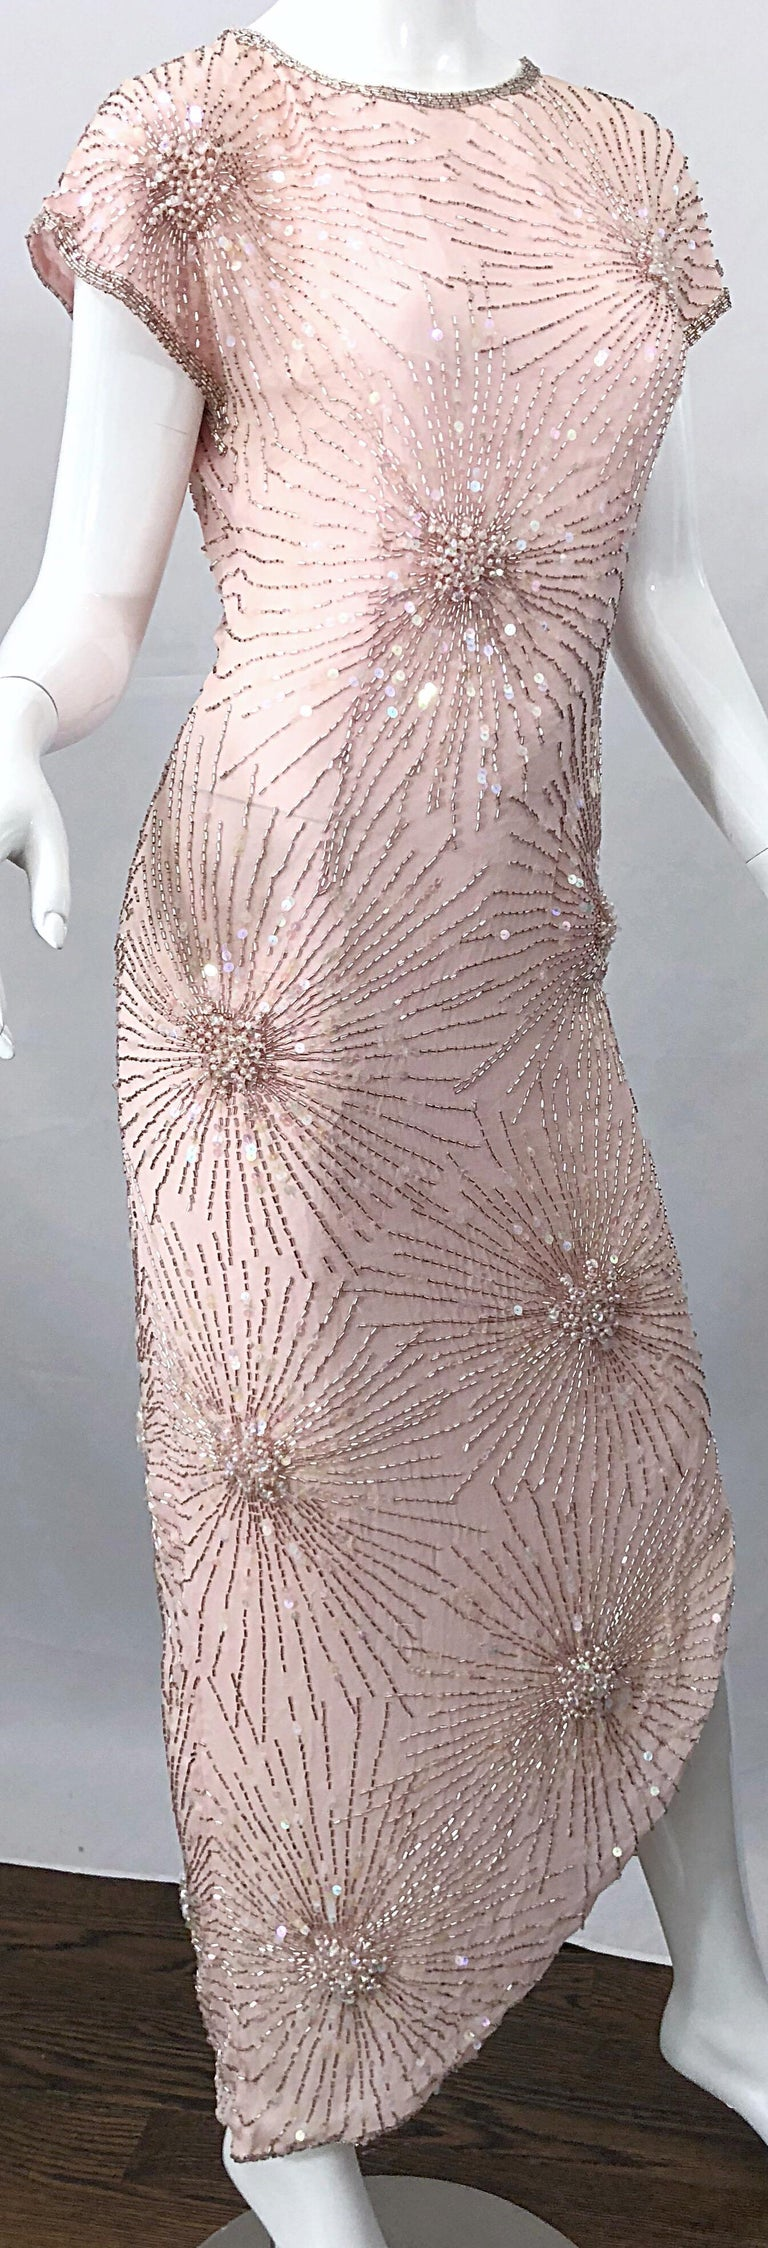 Vintage 70s Lillie Rubin Firework Pale Pink Silk Bead Sequin Asymmetrical Dress For Sale 1